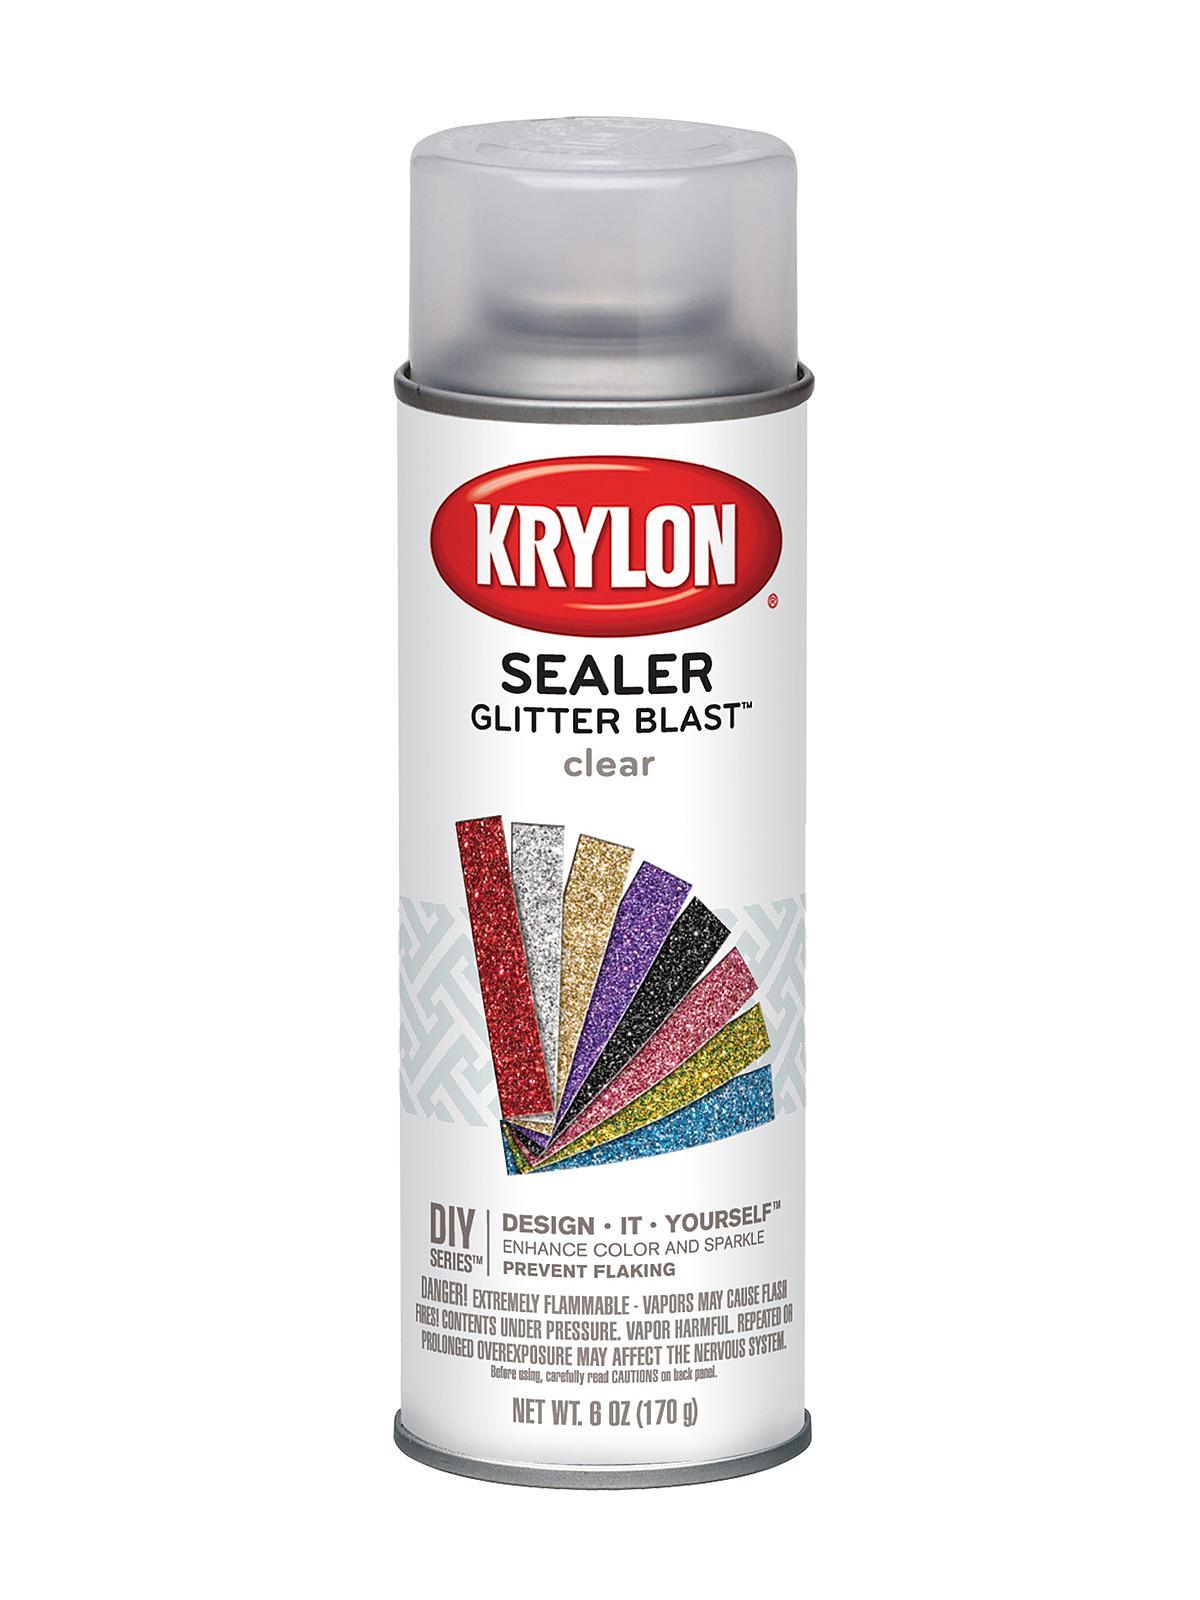 krylon glitter blast clear spray sealer On clear sealant for crafts